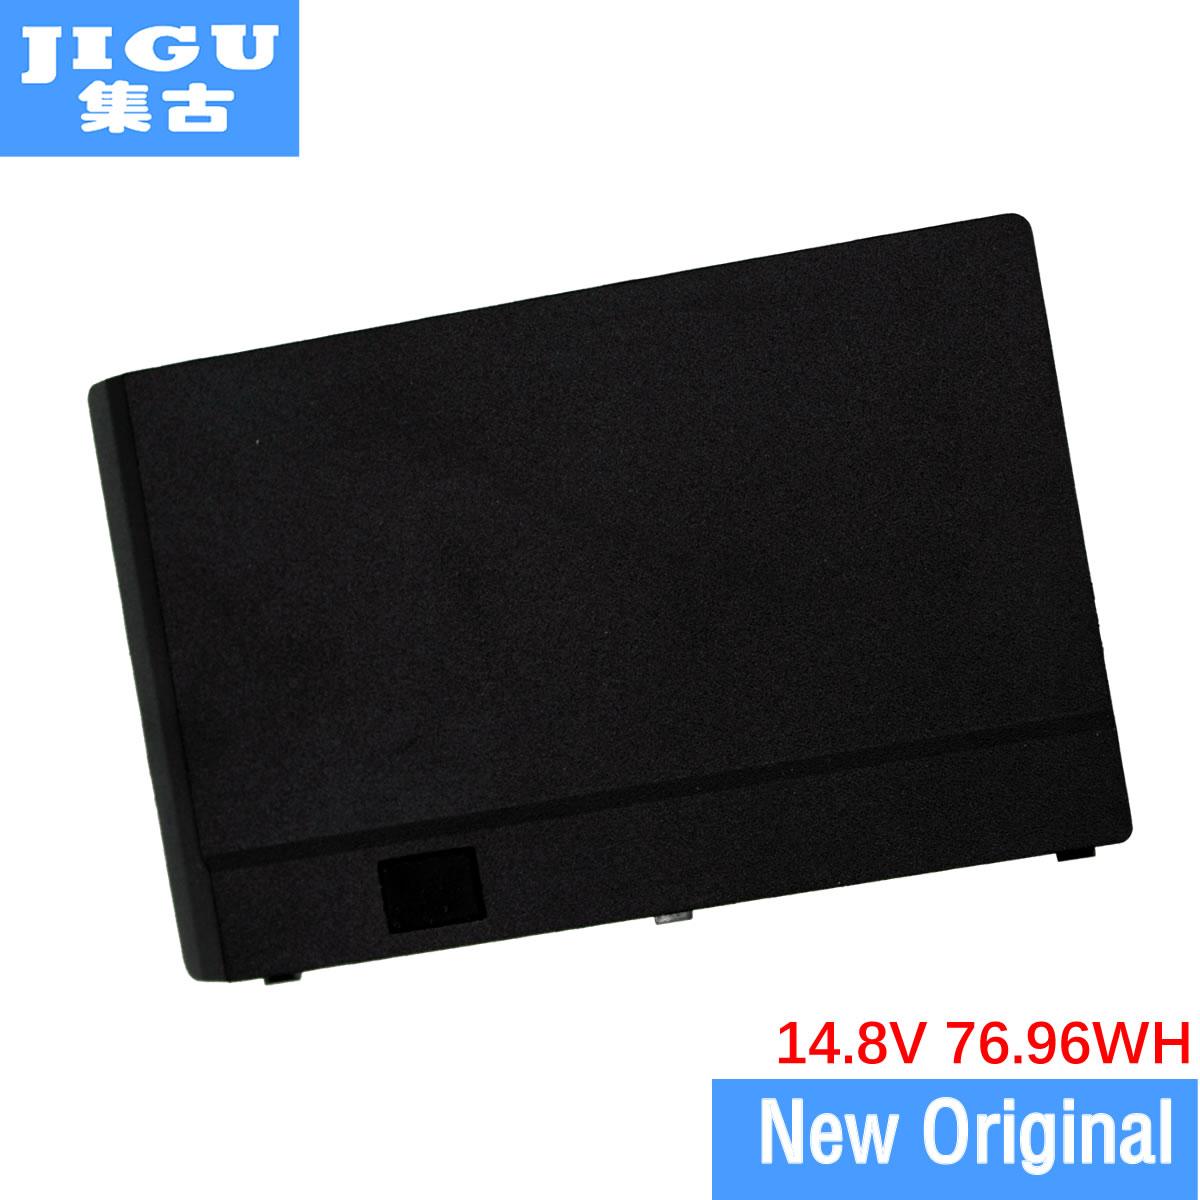 JIGU 5200mAh W370bat-8 battery for Clevo W350et W350etq W370et Sager Np6350 Np6370 Xmg A522 Xmg Xmg A722 6-87-w370s-4271 original rechargeable clevo w370bat 8 li ion battery 6 87 w370s 4271 6 87 w37ss 427 k590s laptop battery 14 8v 5200mah 76 96wh